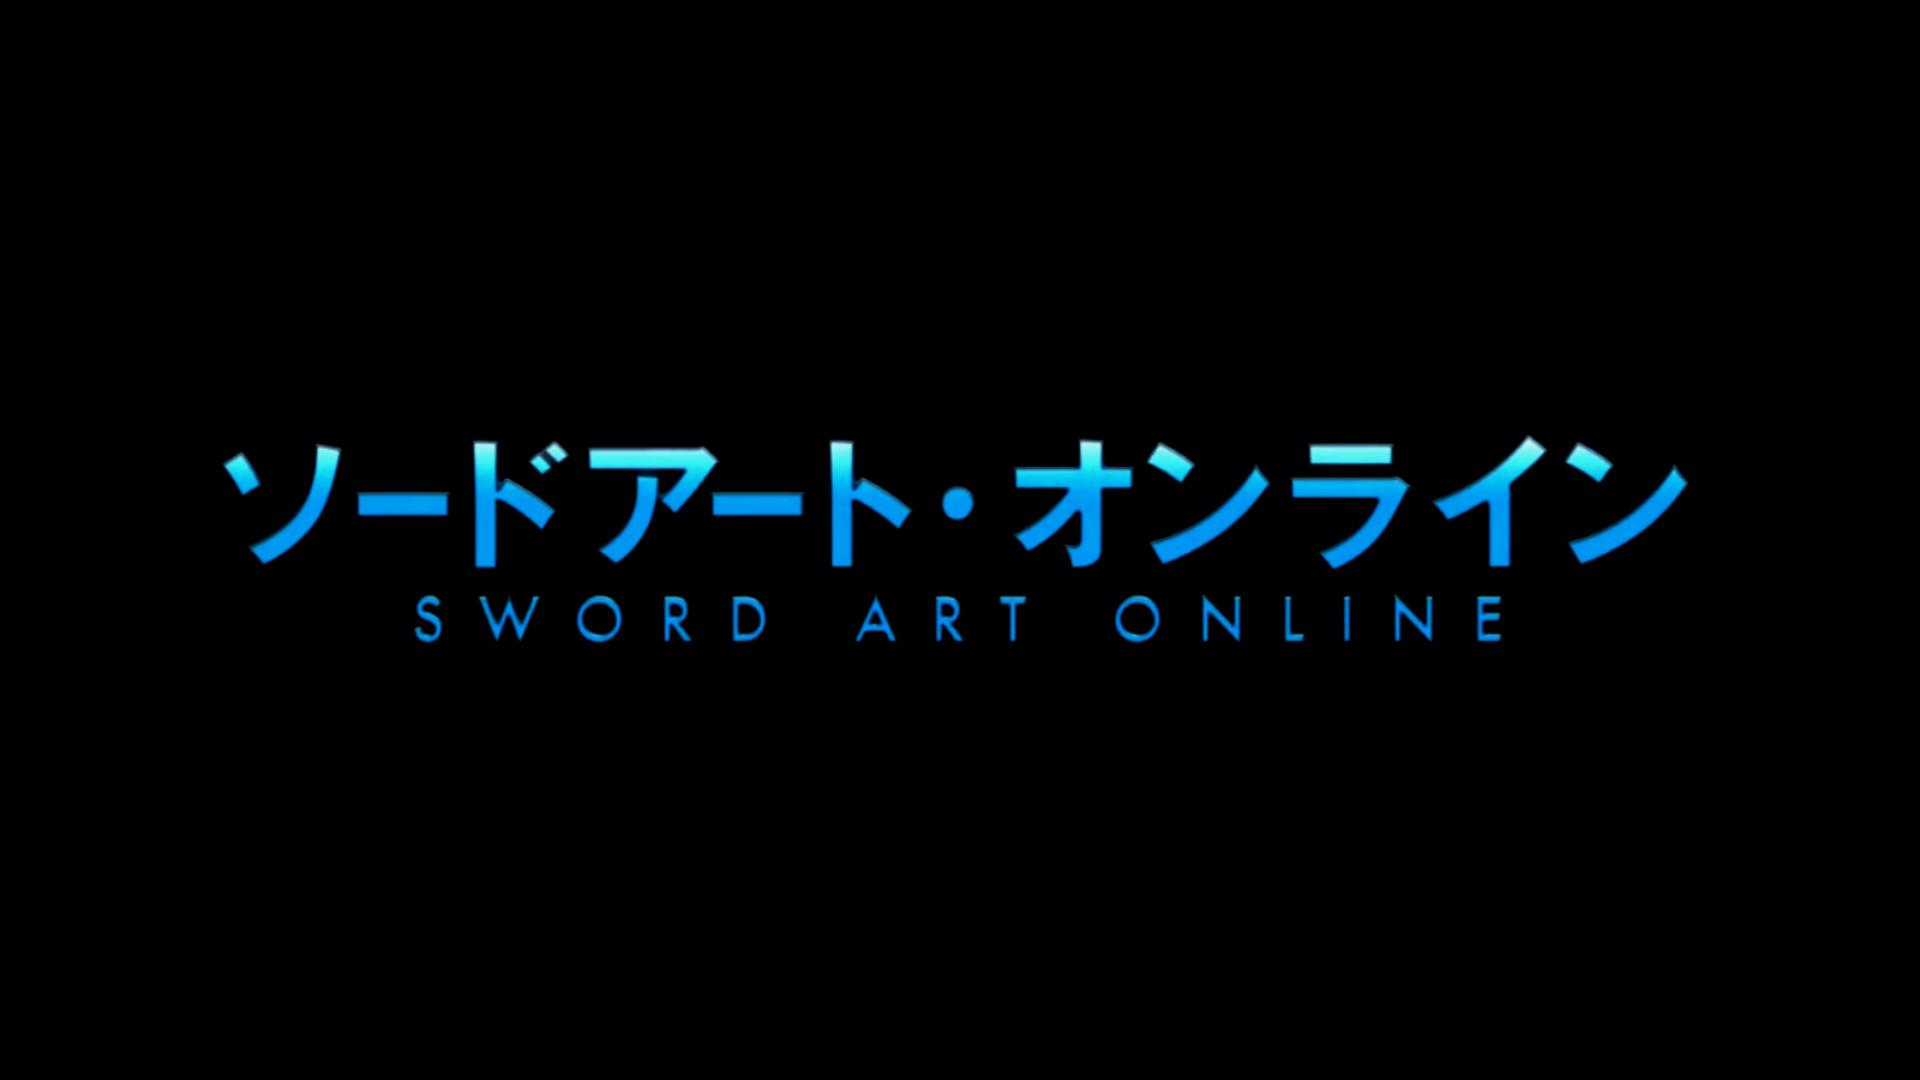 Res: 1920x1080, Sword Art Online HD Wallpaper